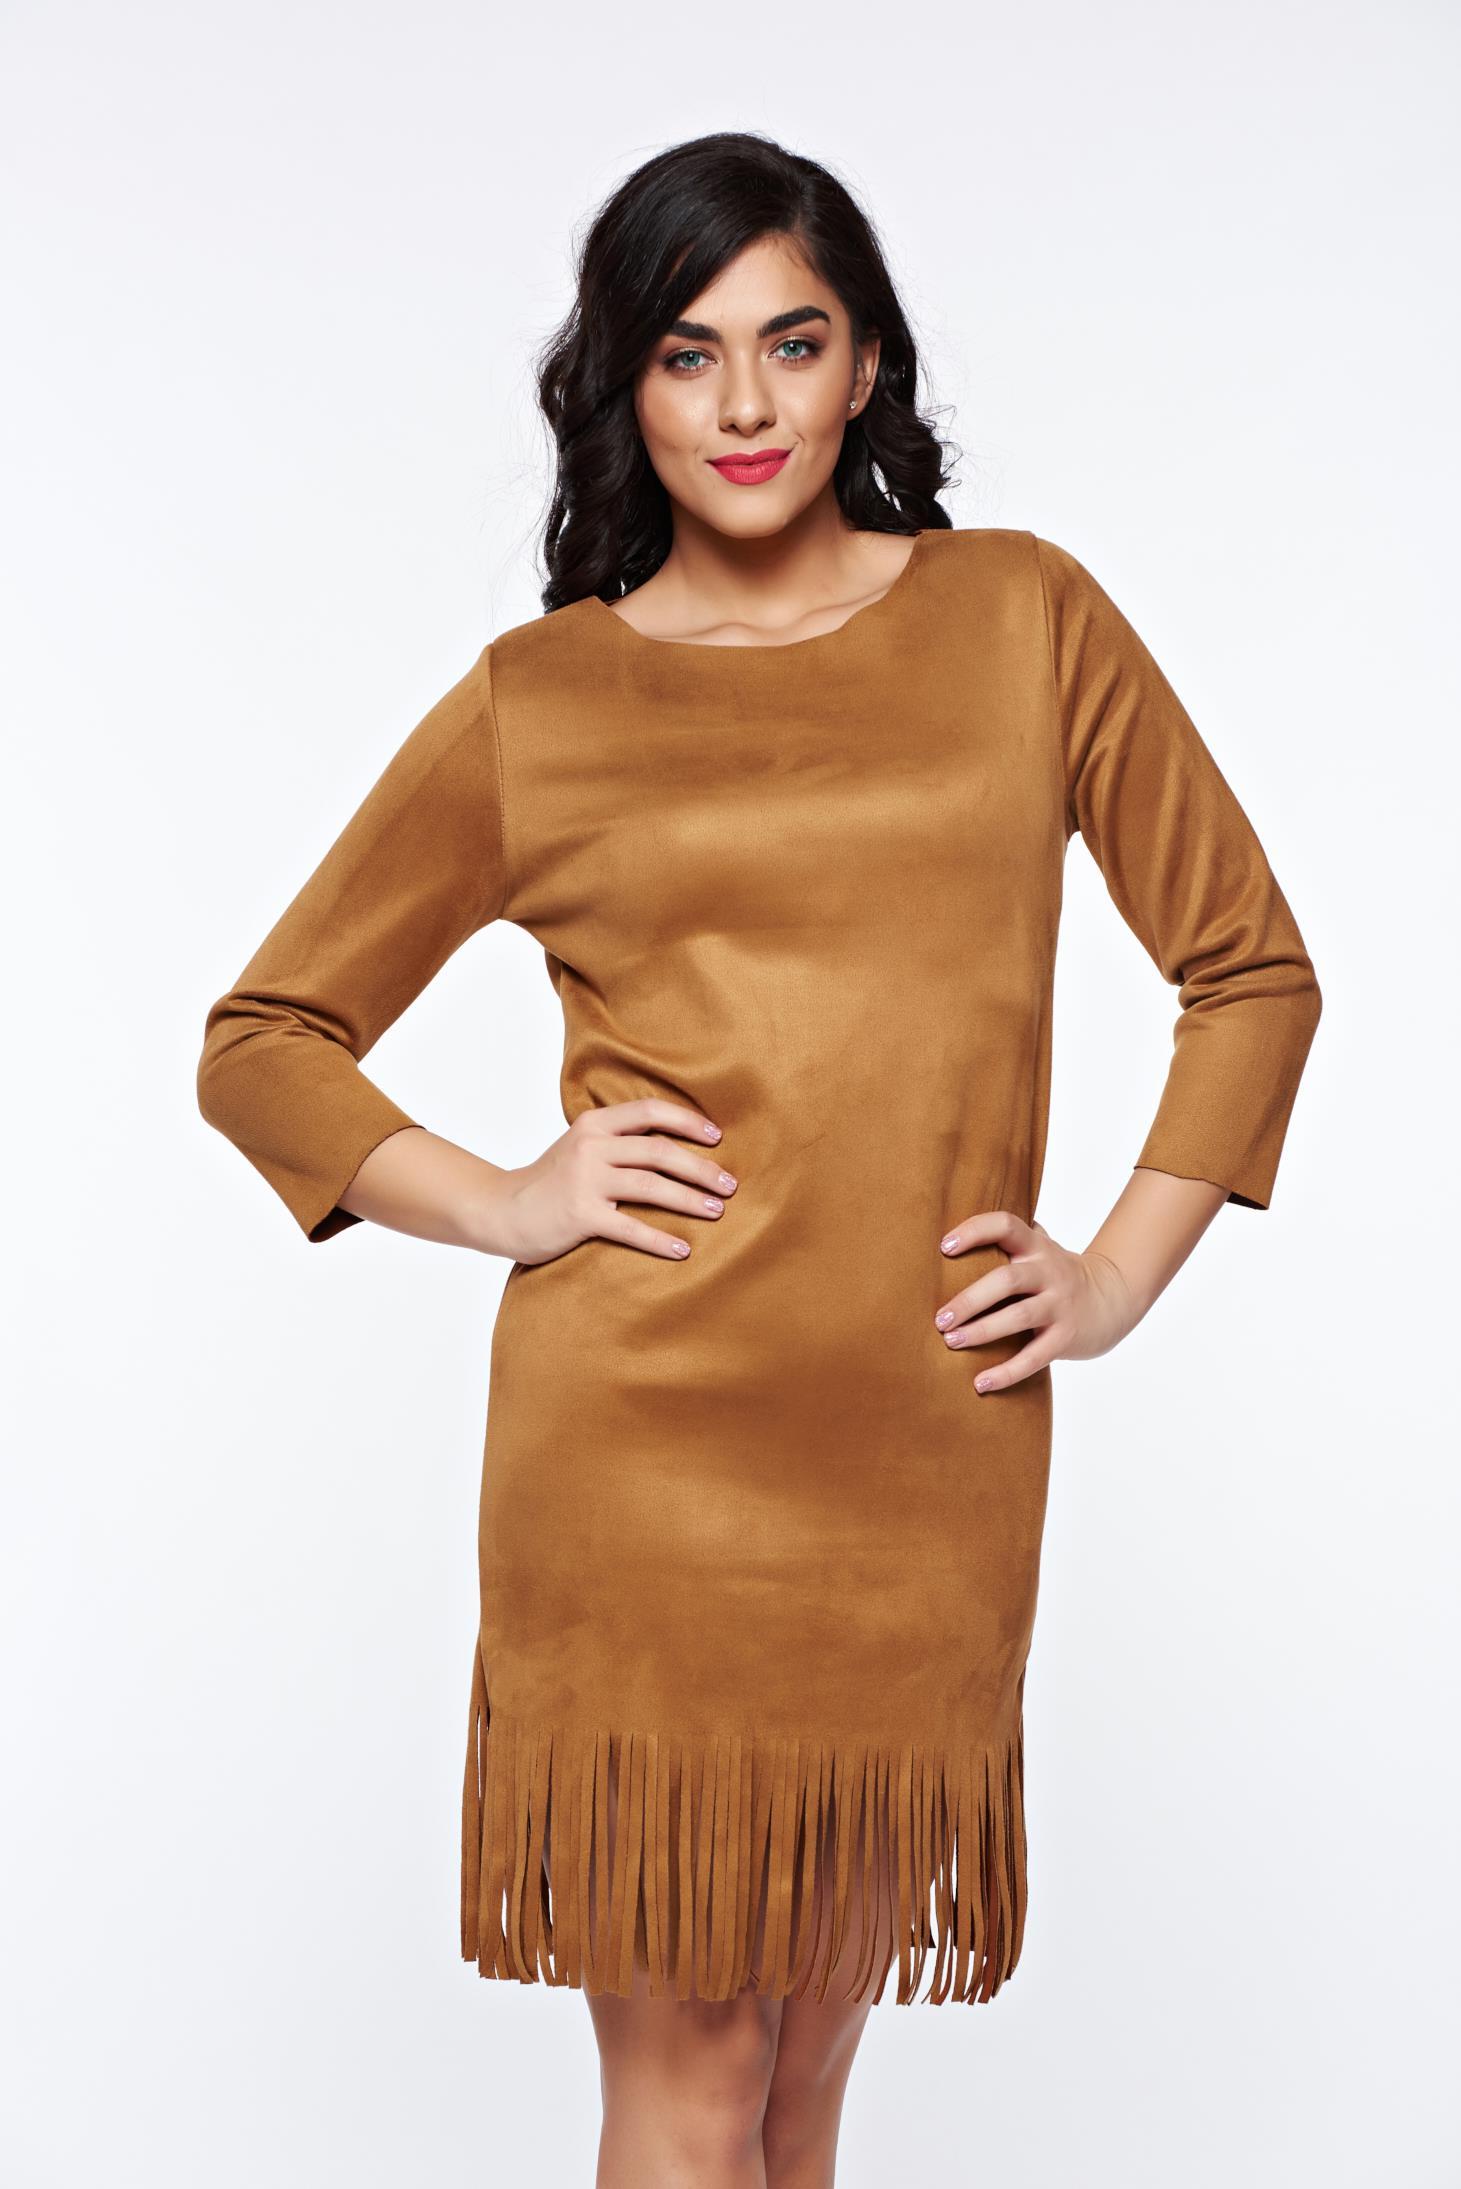 Rochie maro casual cu croi larg din material catifelat usor elastic cu franjuri